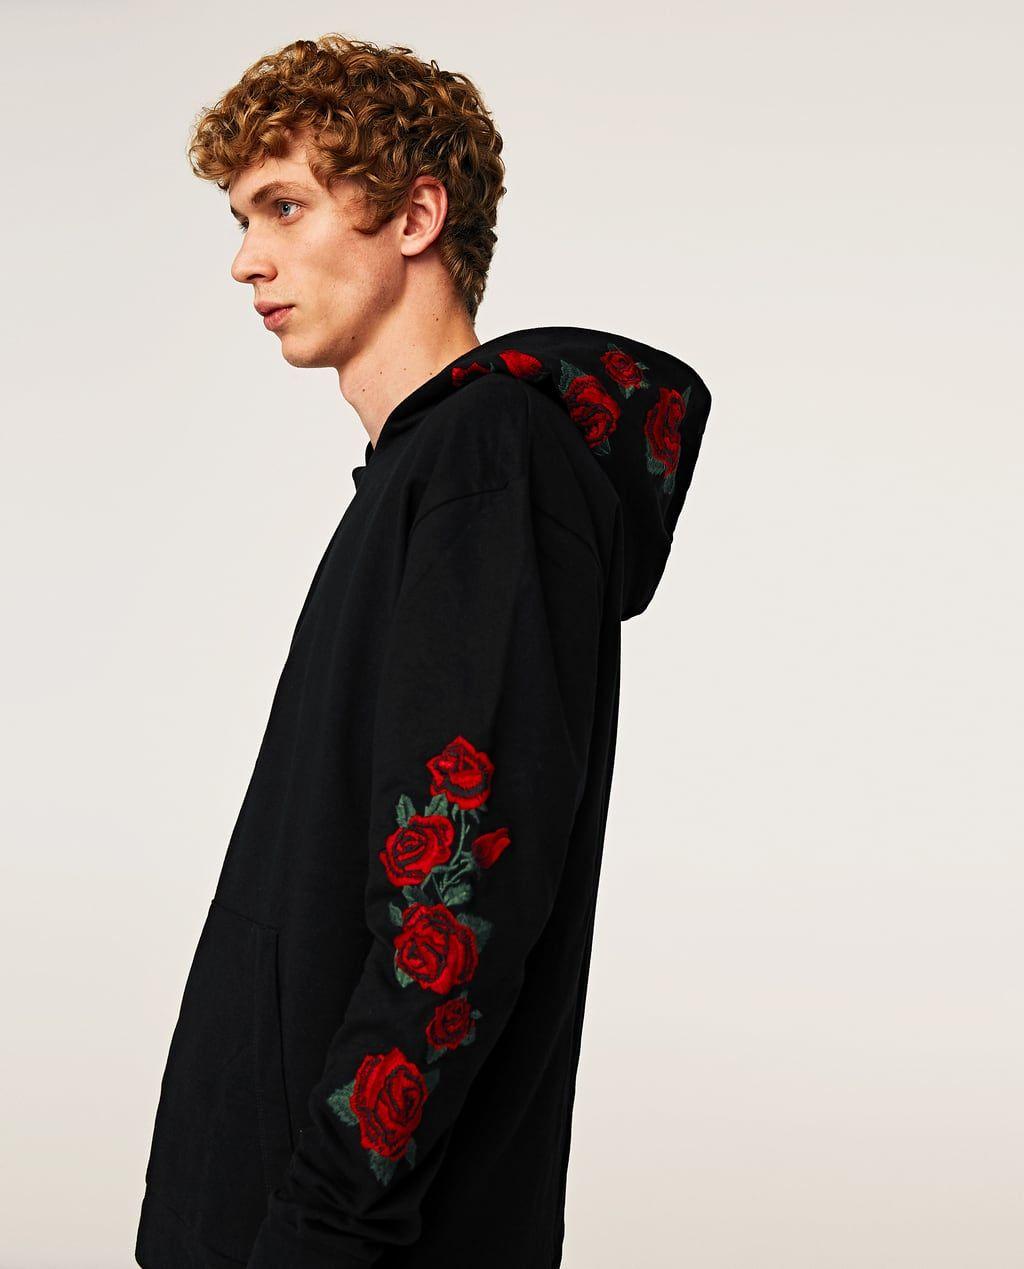 Zara 3 En Rosas Imagen Hoodies Sweats amp; Sudadera De 2018 AI7wwxq1